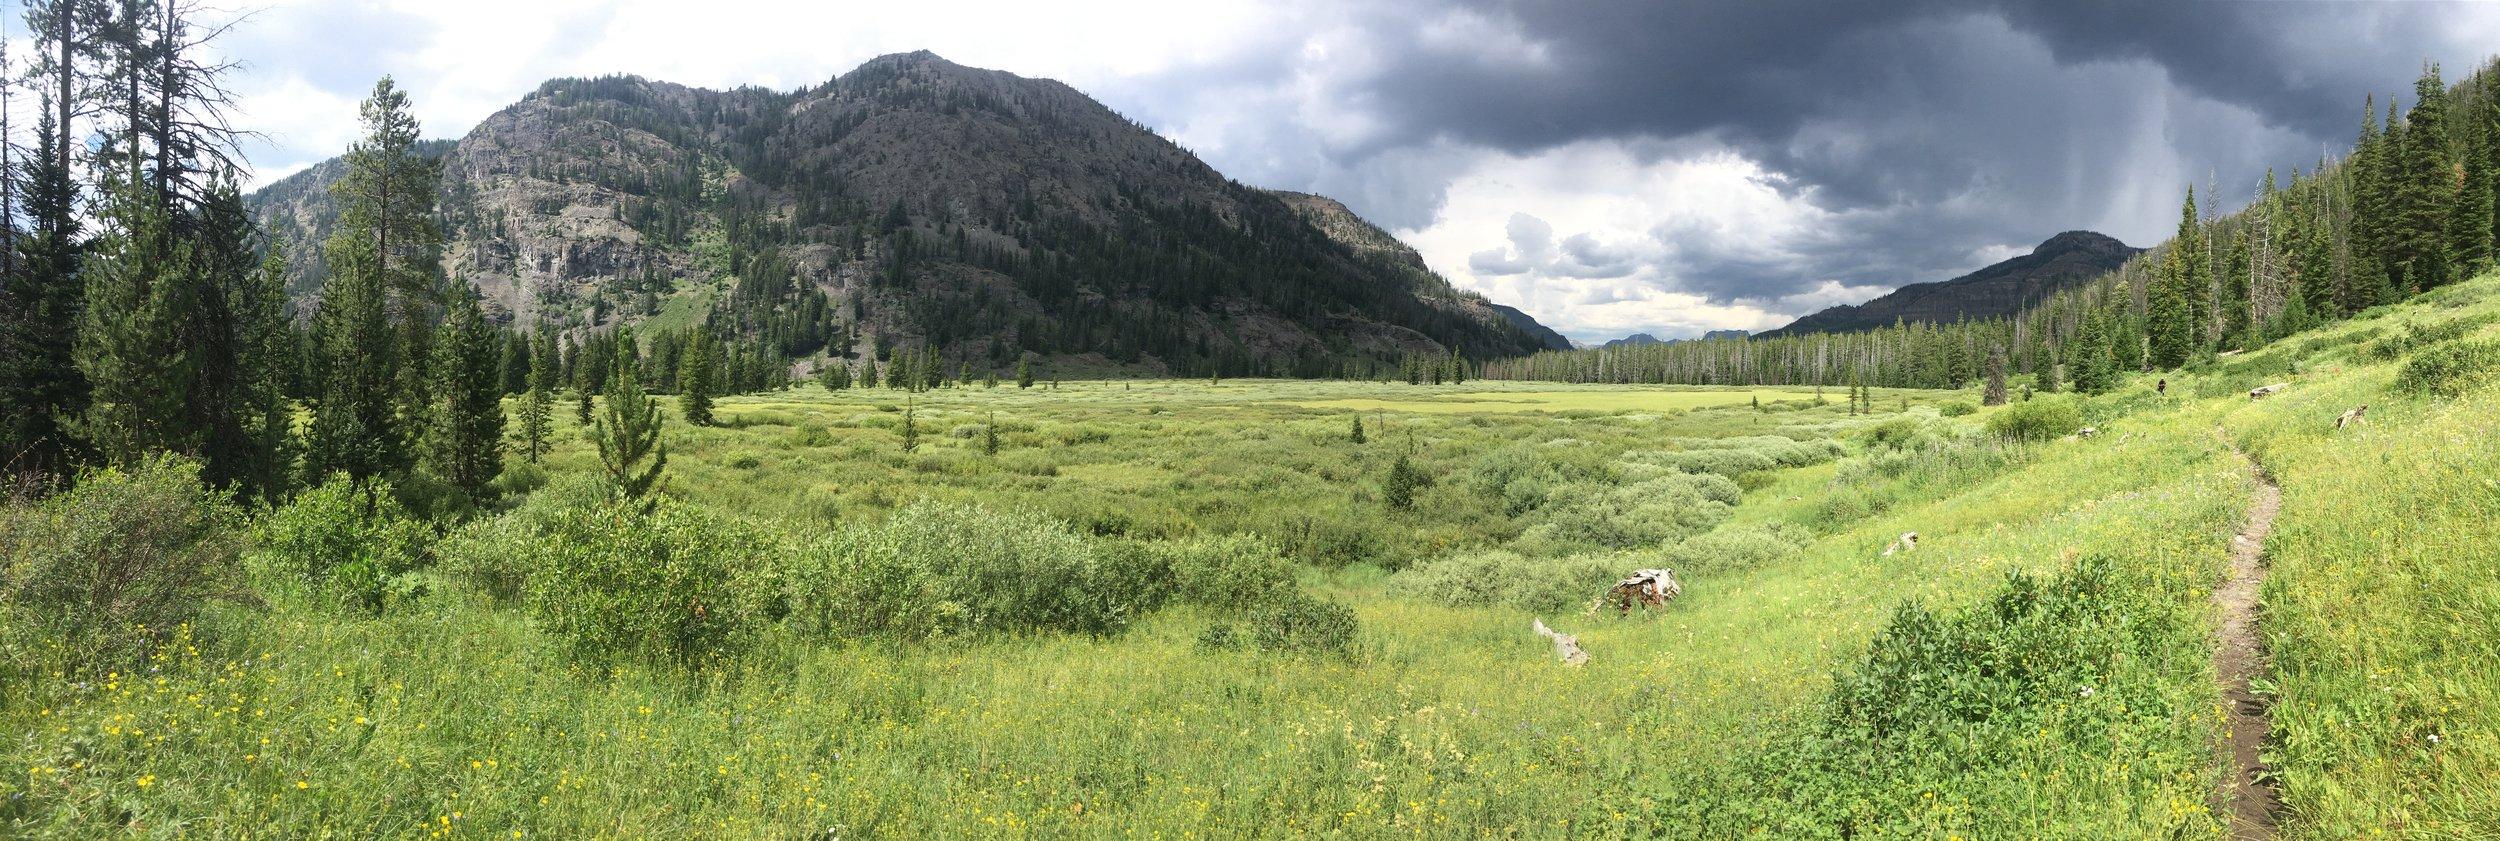 Eagle Creek Meadows